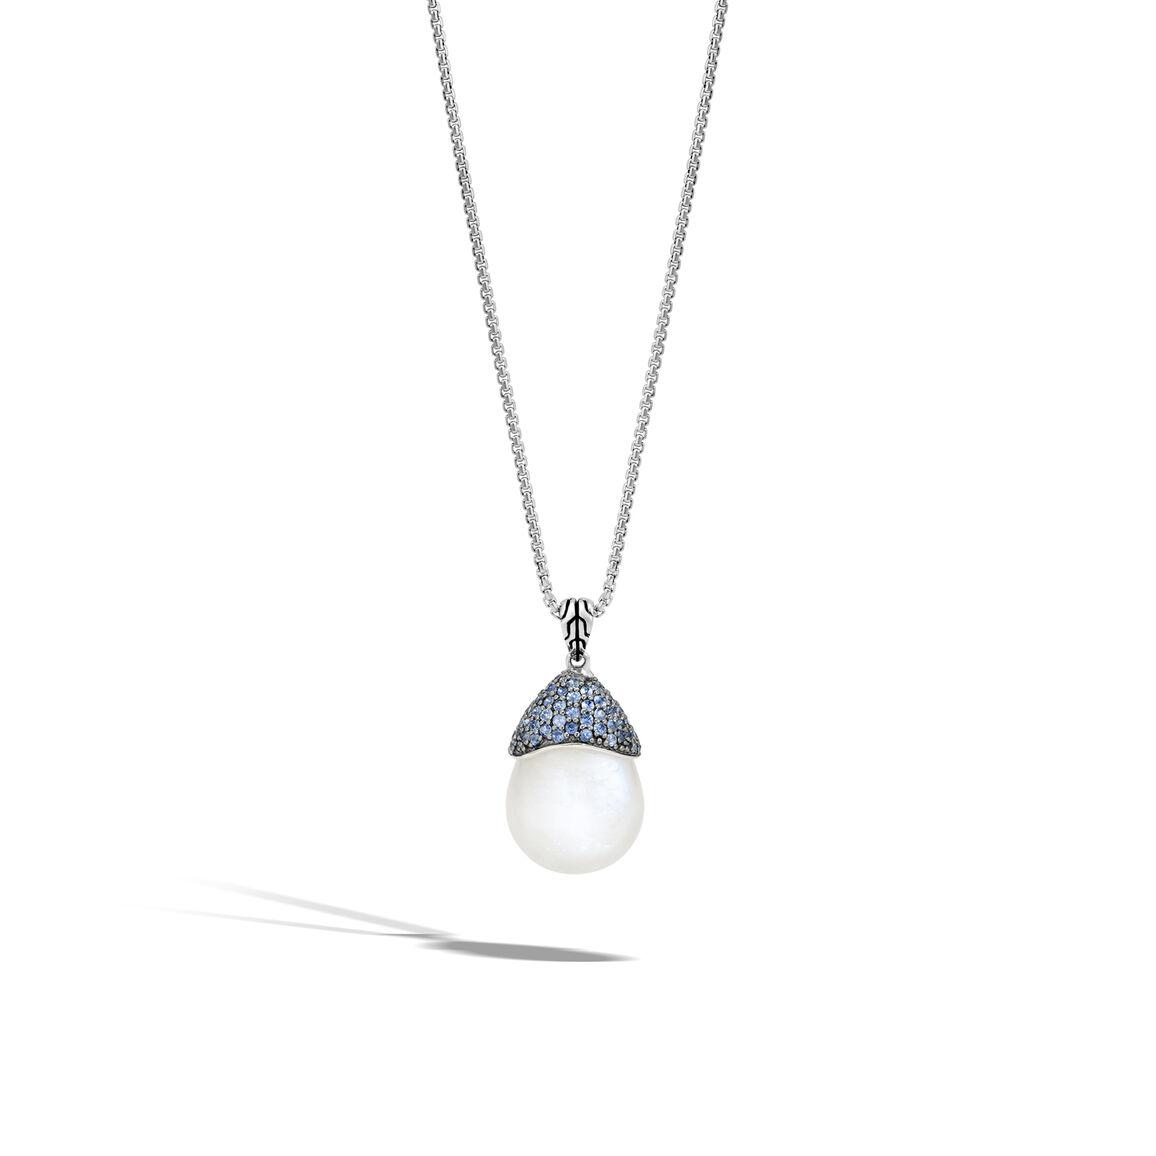 Classic Chain Celestial Orb Pendant, Silver, 19x16MM Gemstone